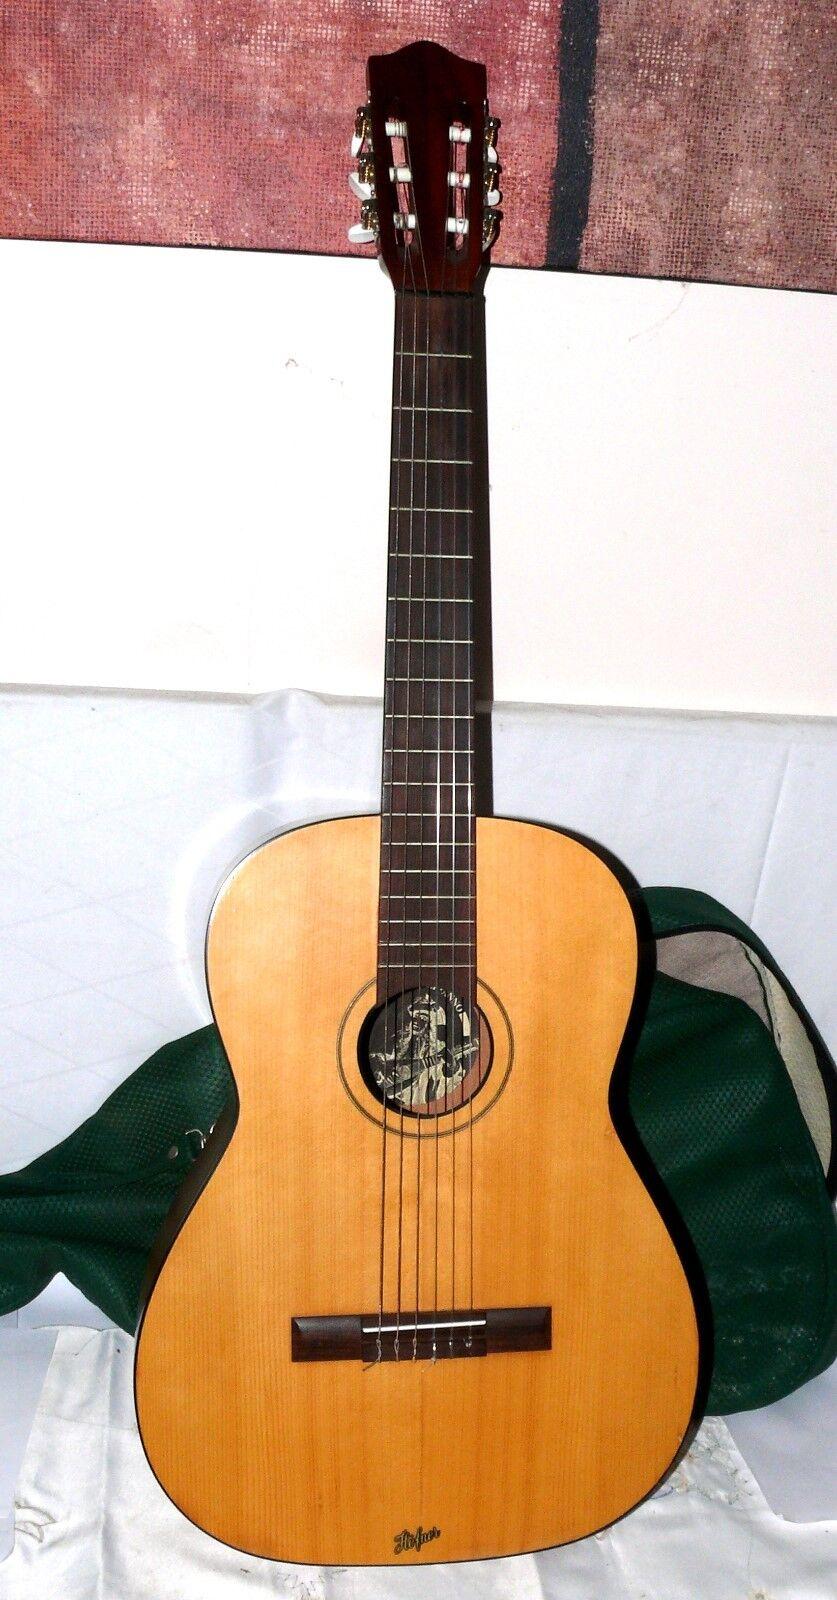 Höfner Acoustic Guitar Klassik Akustik Konzert-Gitarre Modell 1977  13377